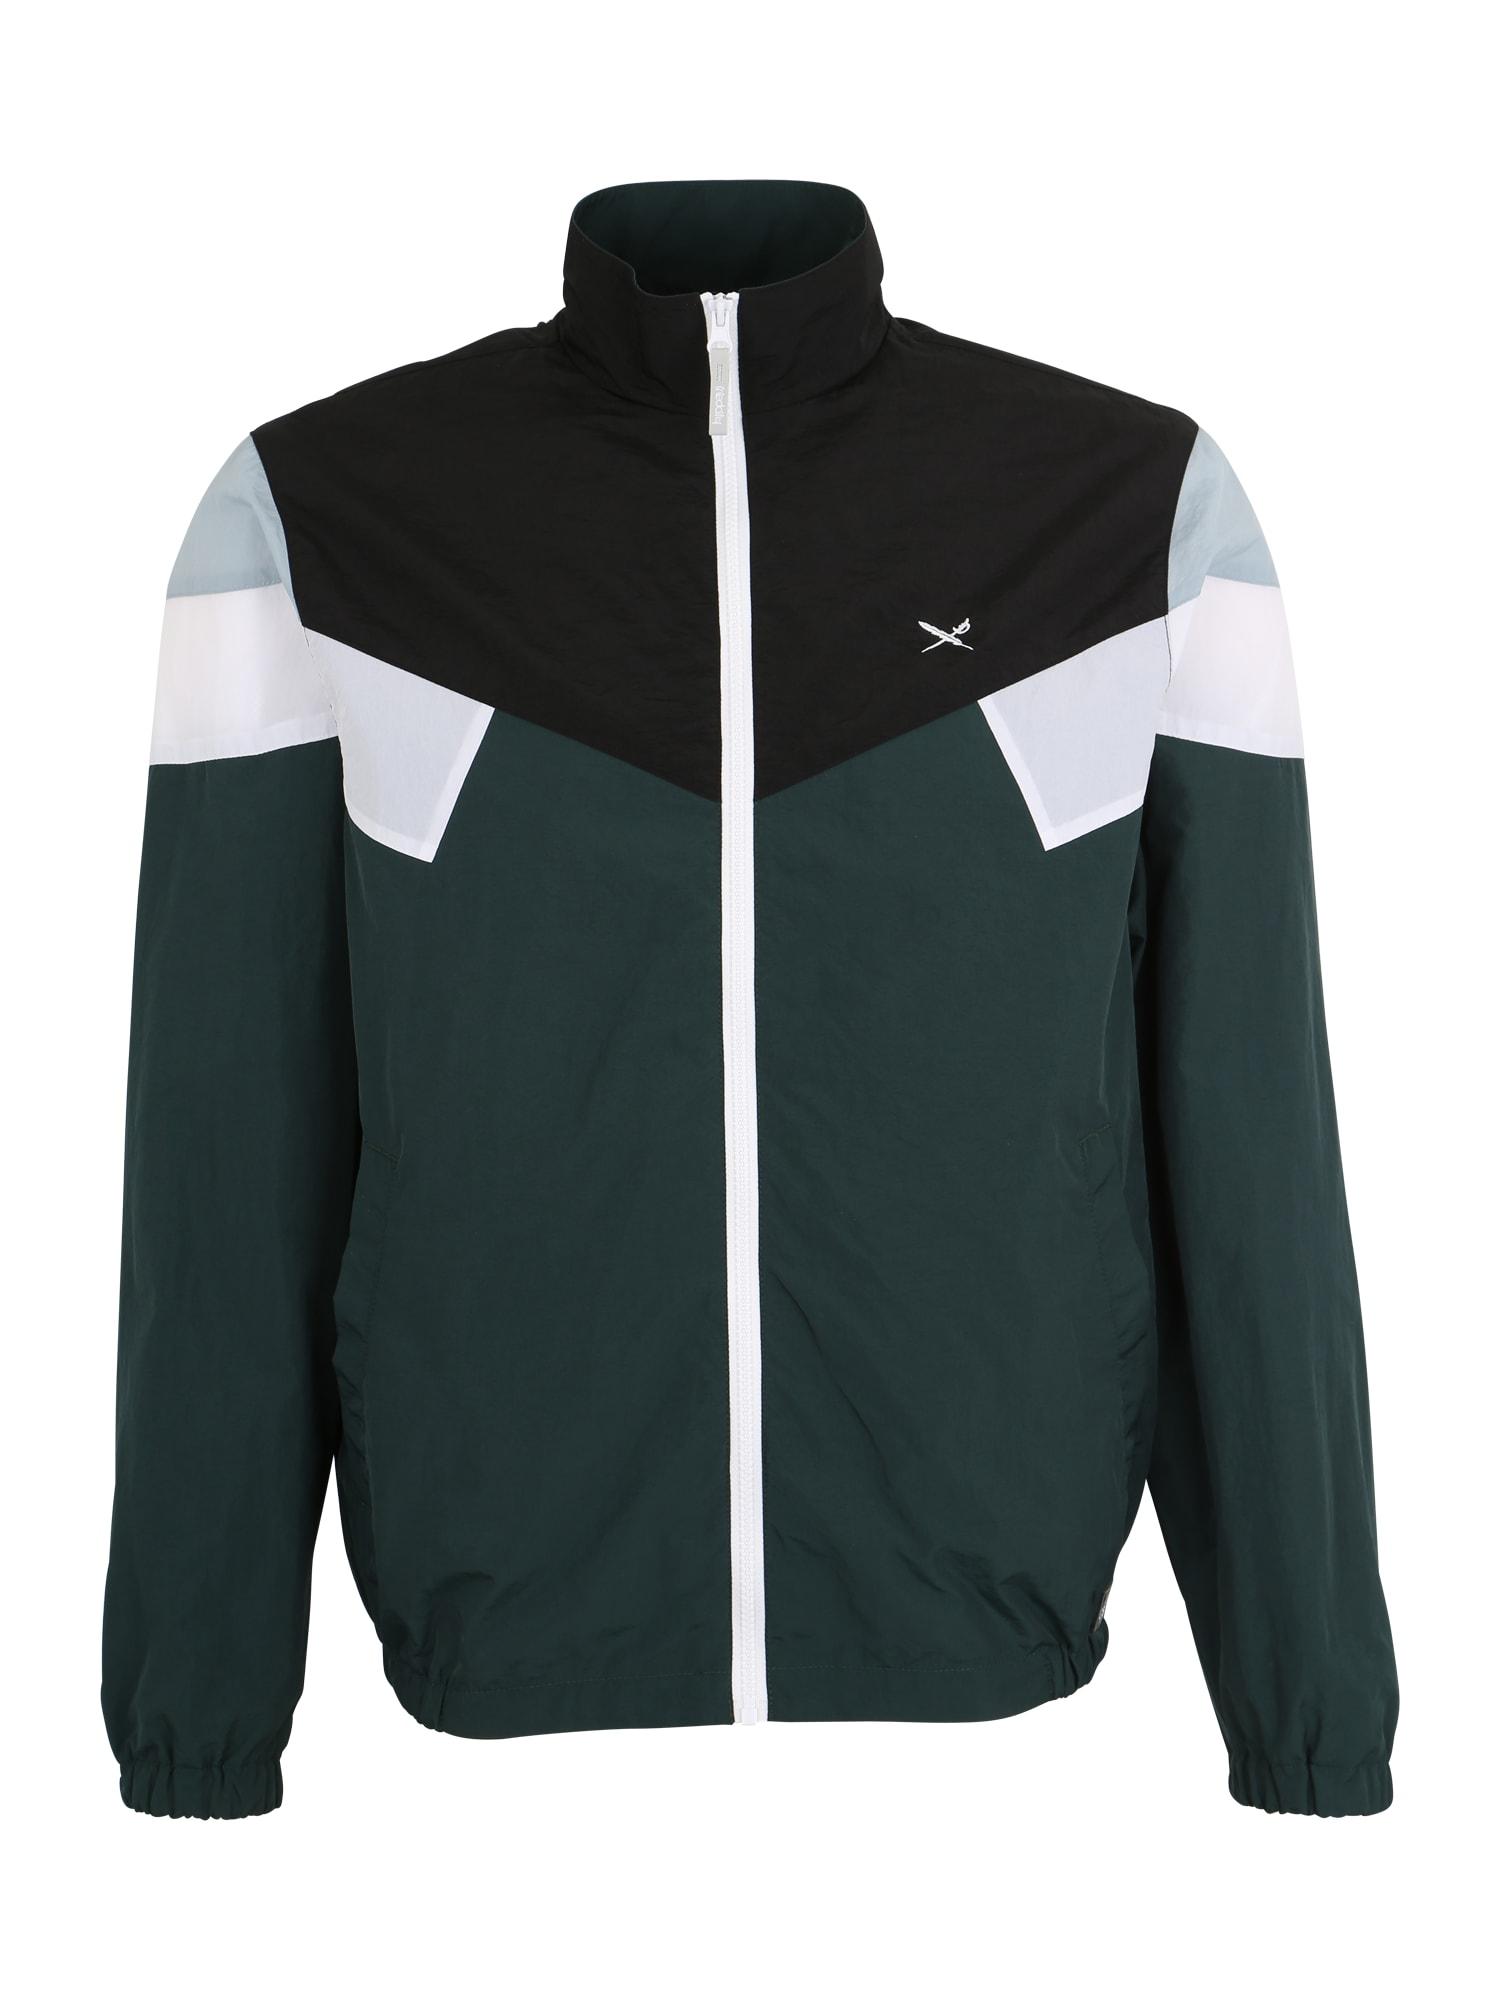 Přechodná bunda Get Down tmavě zelená černá bílá Iriedaily